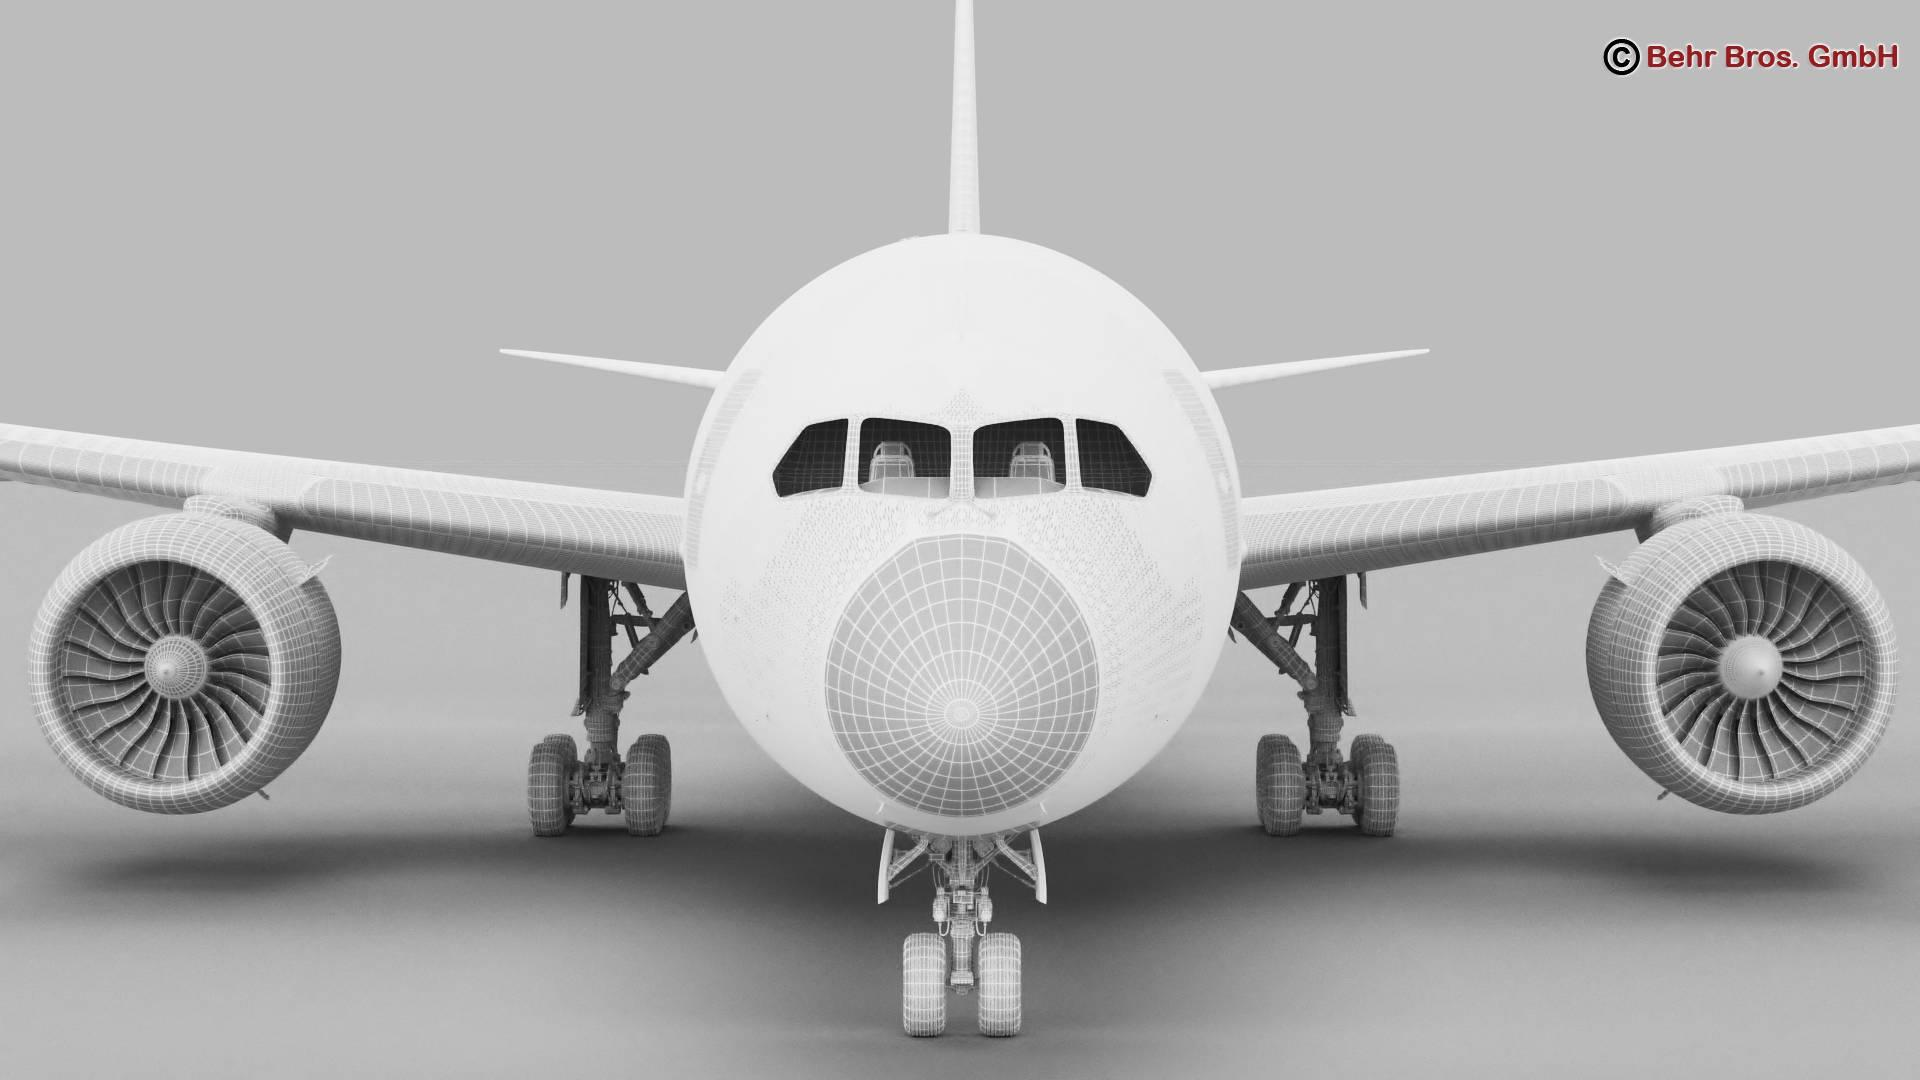 boeing 787-8 3d model 3ds max fbx c4d lwo ma mb obj 251363